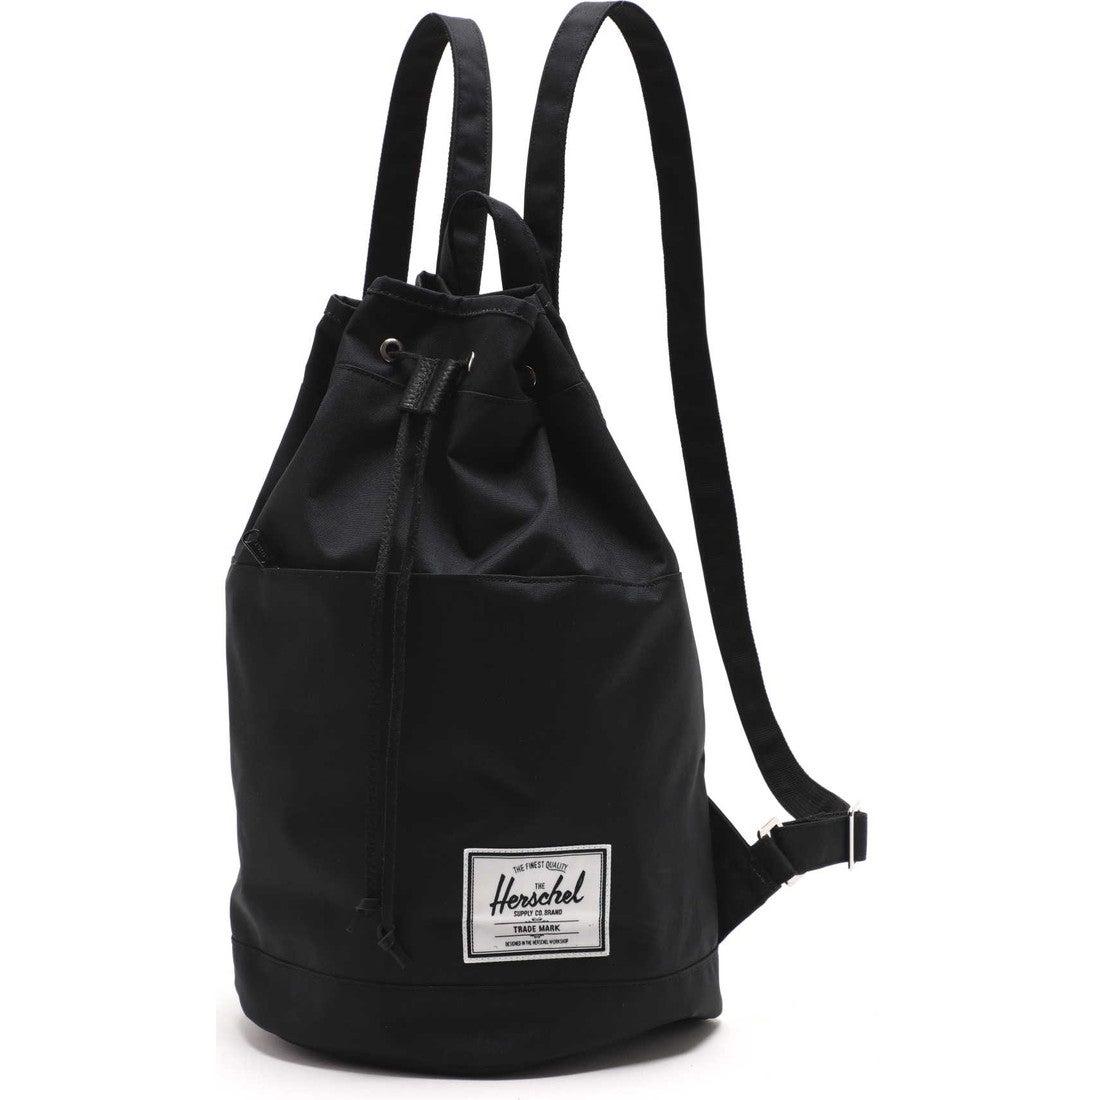 239bafdafbcf ROSE BUD ハーシェル巾着バックパック ブラック1 -レディースファッション通販 ロコンドガールズコレクション (LOCONDO GIRL'S  COLLECTION)